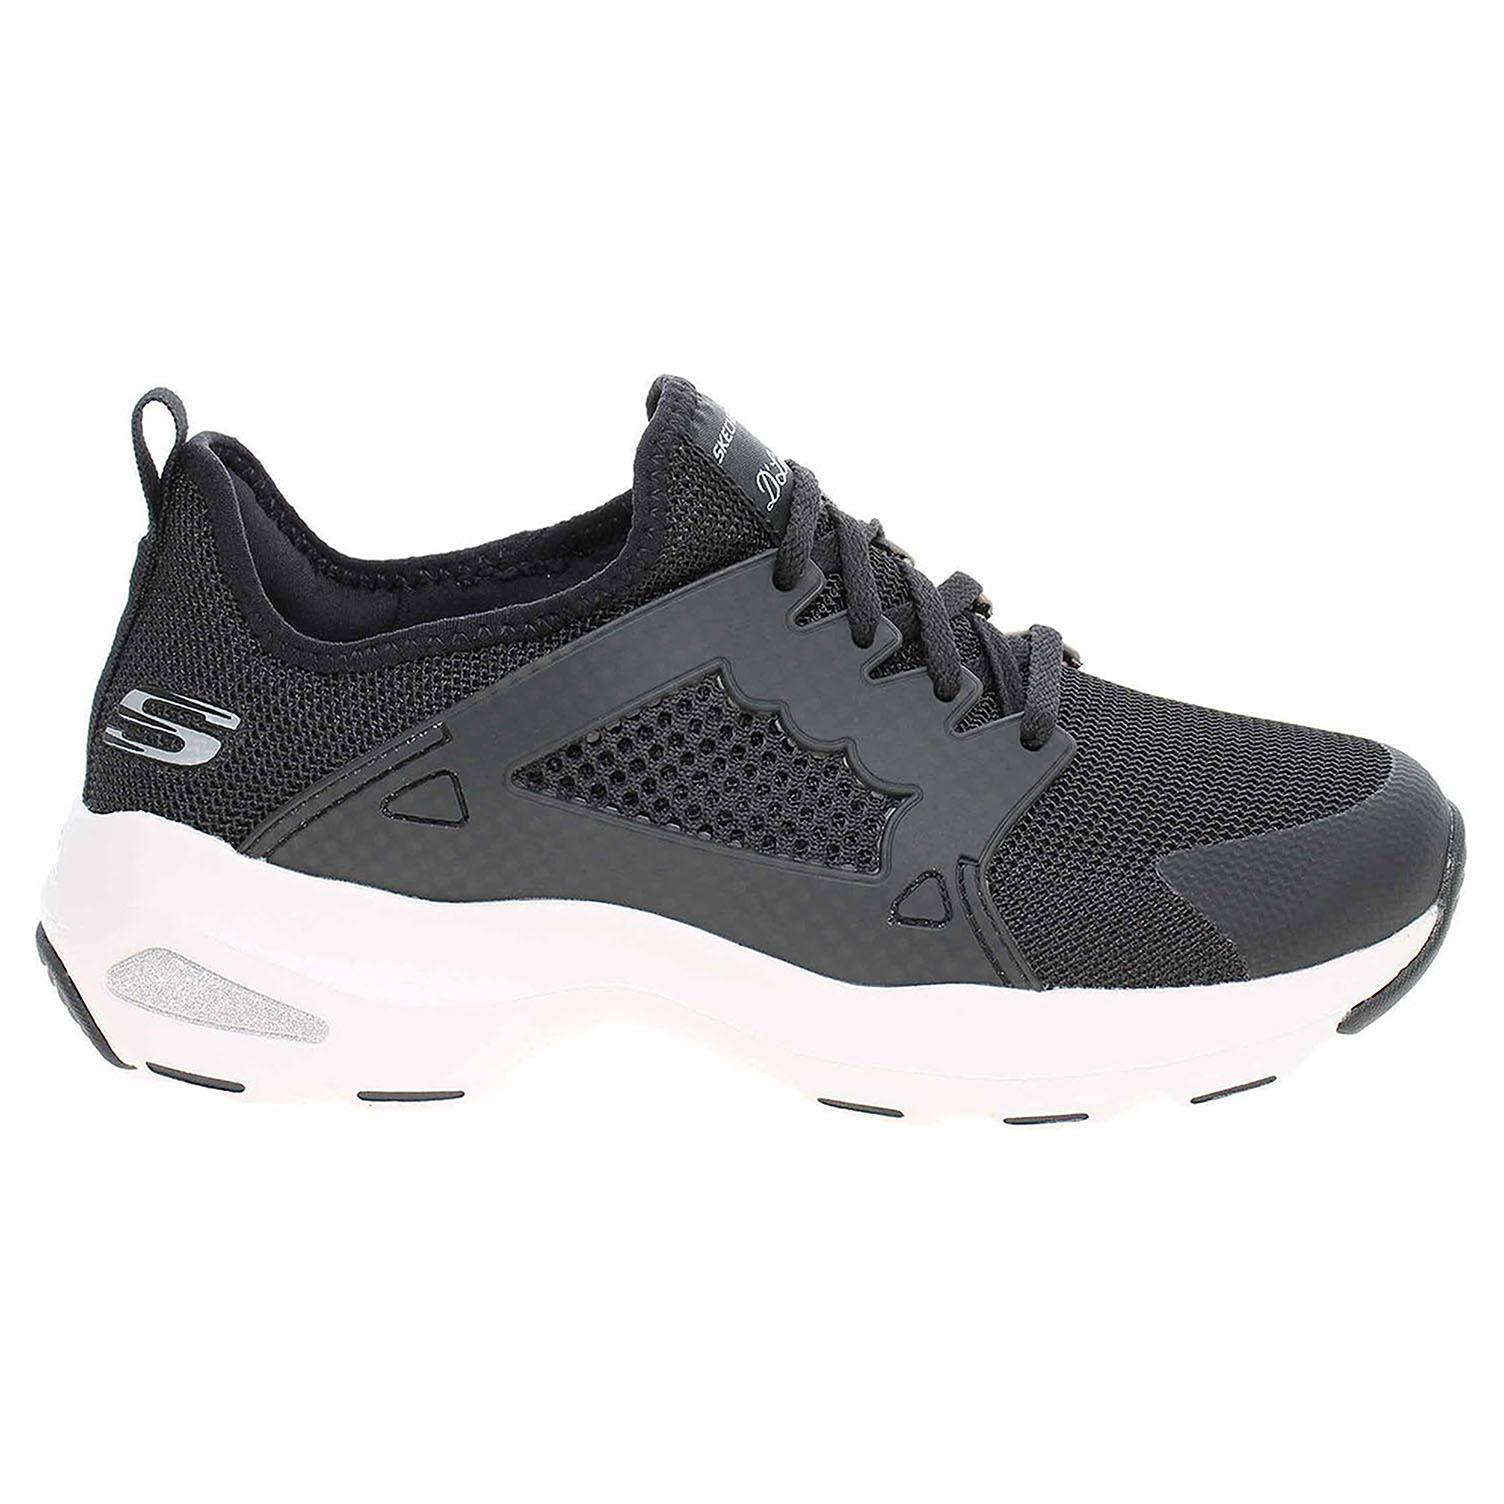 Ecco Skechers D´Lite Ultra - At The Top black-white 23200864 732d703a5d